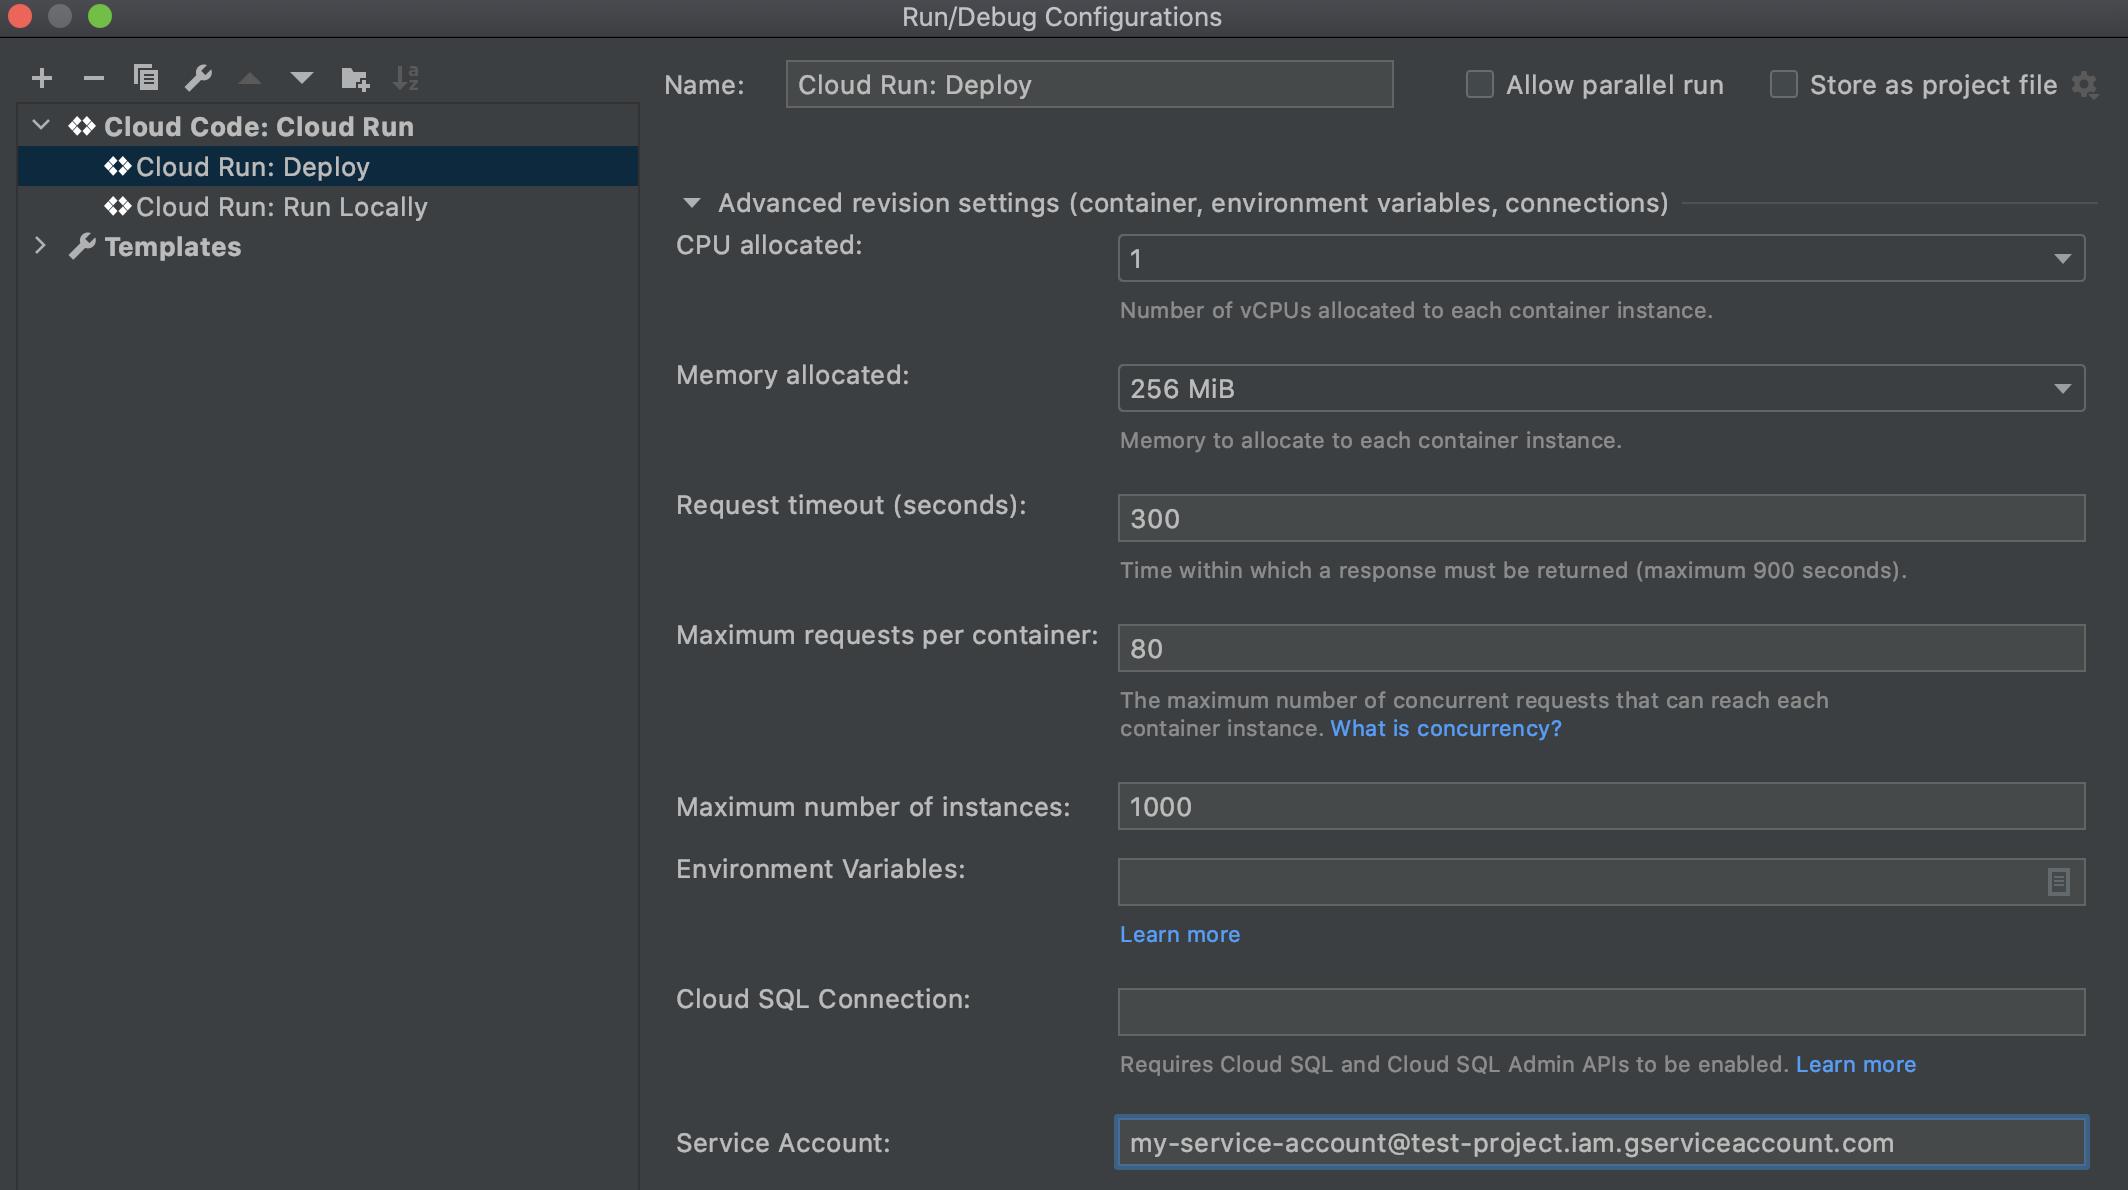 """Cloud Run:部署""中展开了""高级修订版本设置""部分,并且""服务帐号""字段中已填写服务帐号名称(格式为 service-account-name@project-name.iam.gserviceaccount.com)"